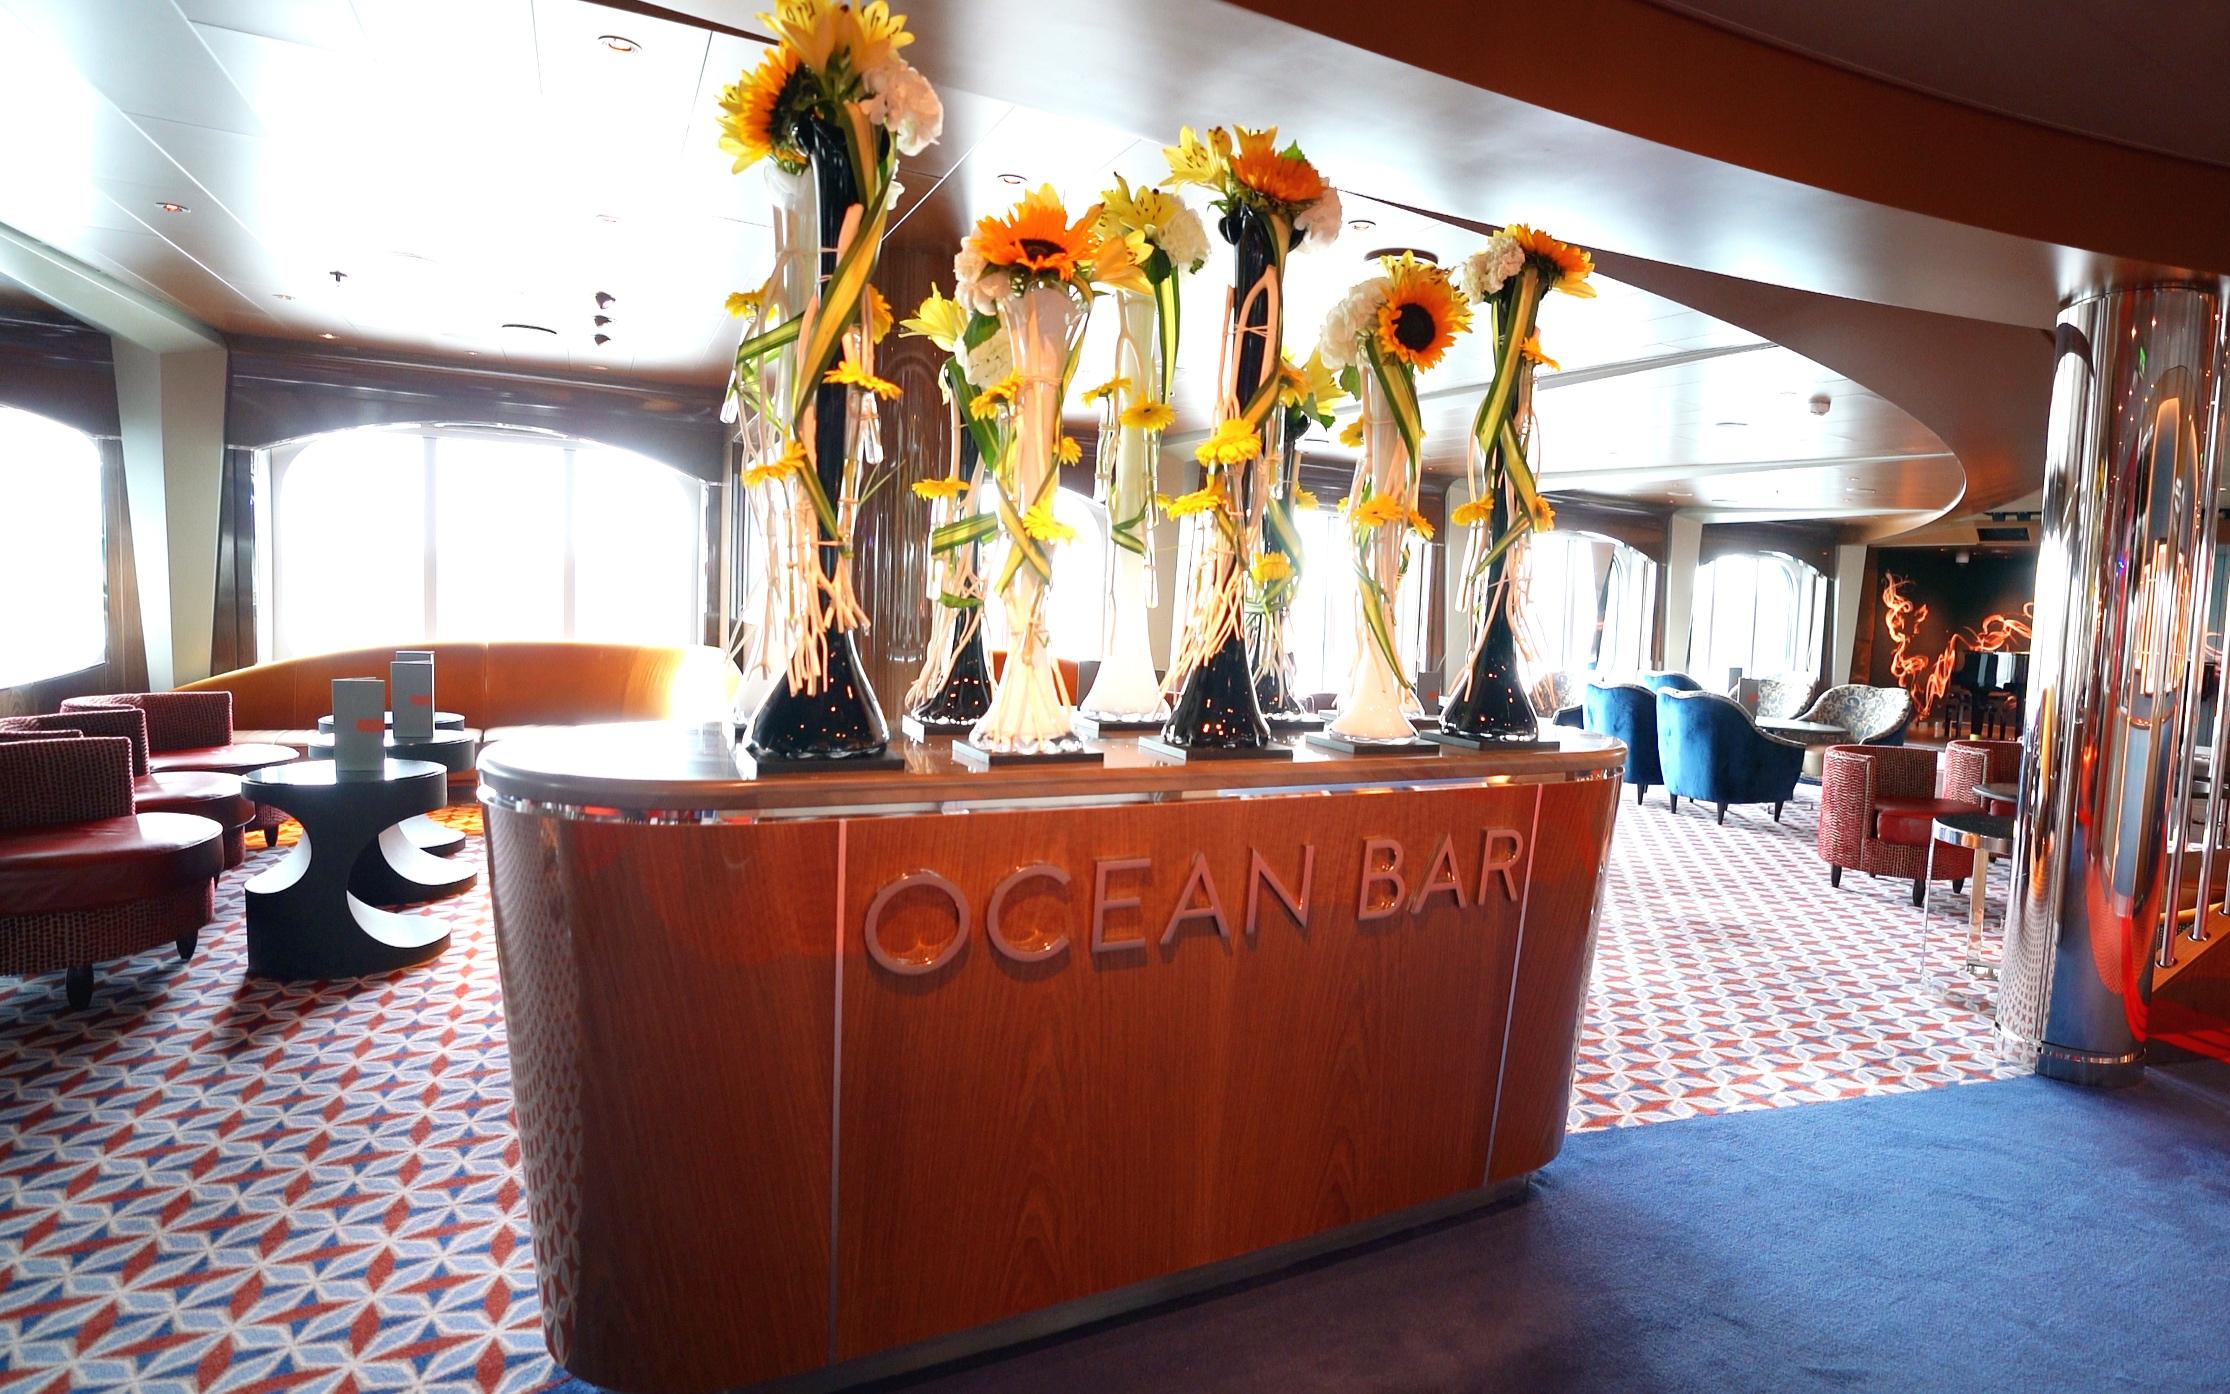 The Ocean bar